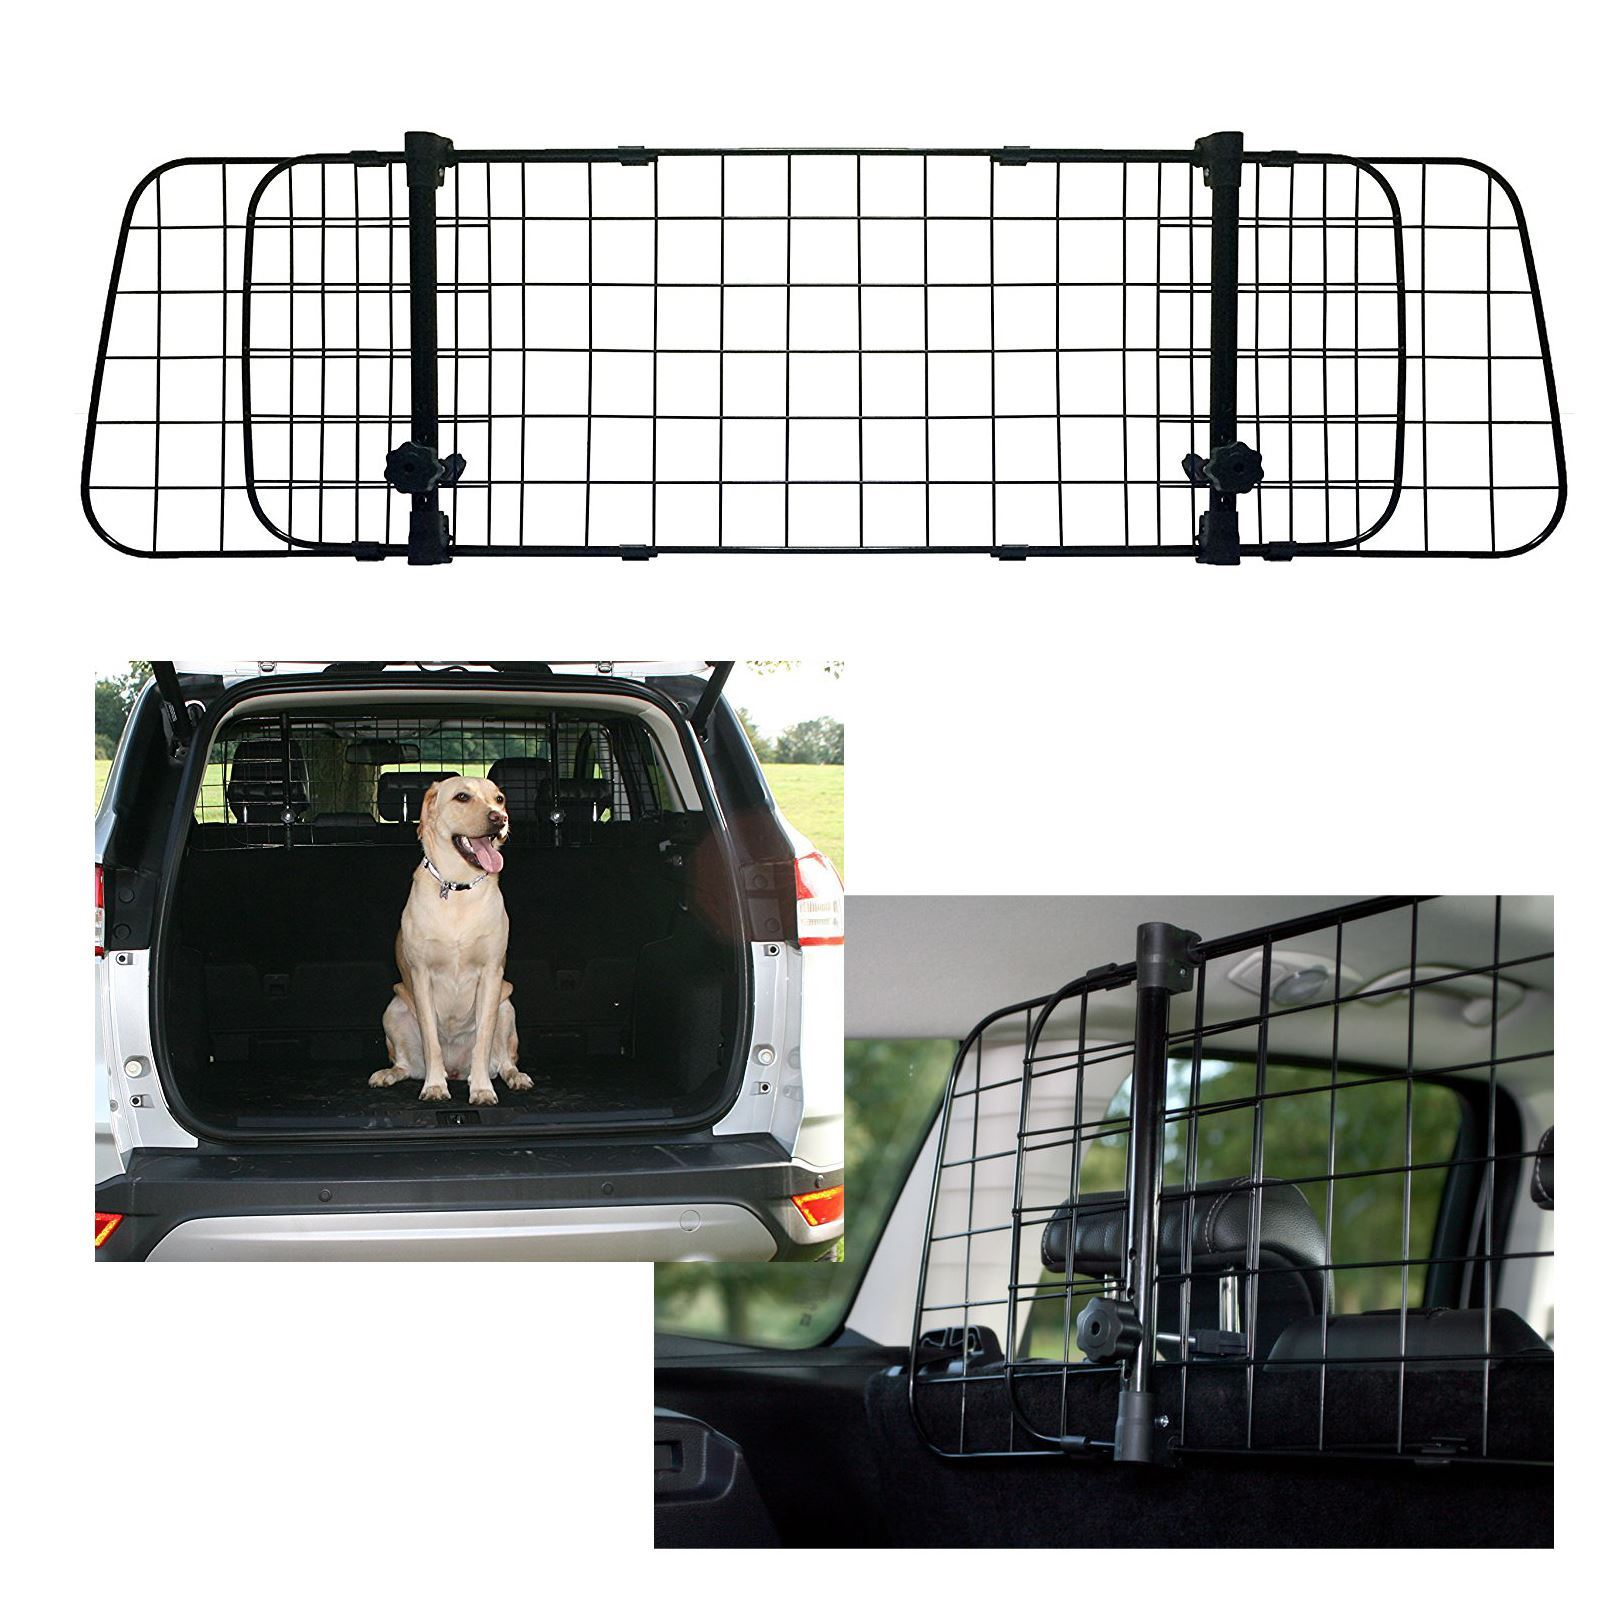 MITSUBISHI MIRAGE 13 TUBULAR DOG PET GUARD BARRIER CAR ANIMAL HEAVY DUTY